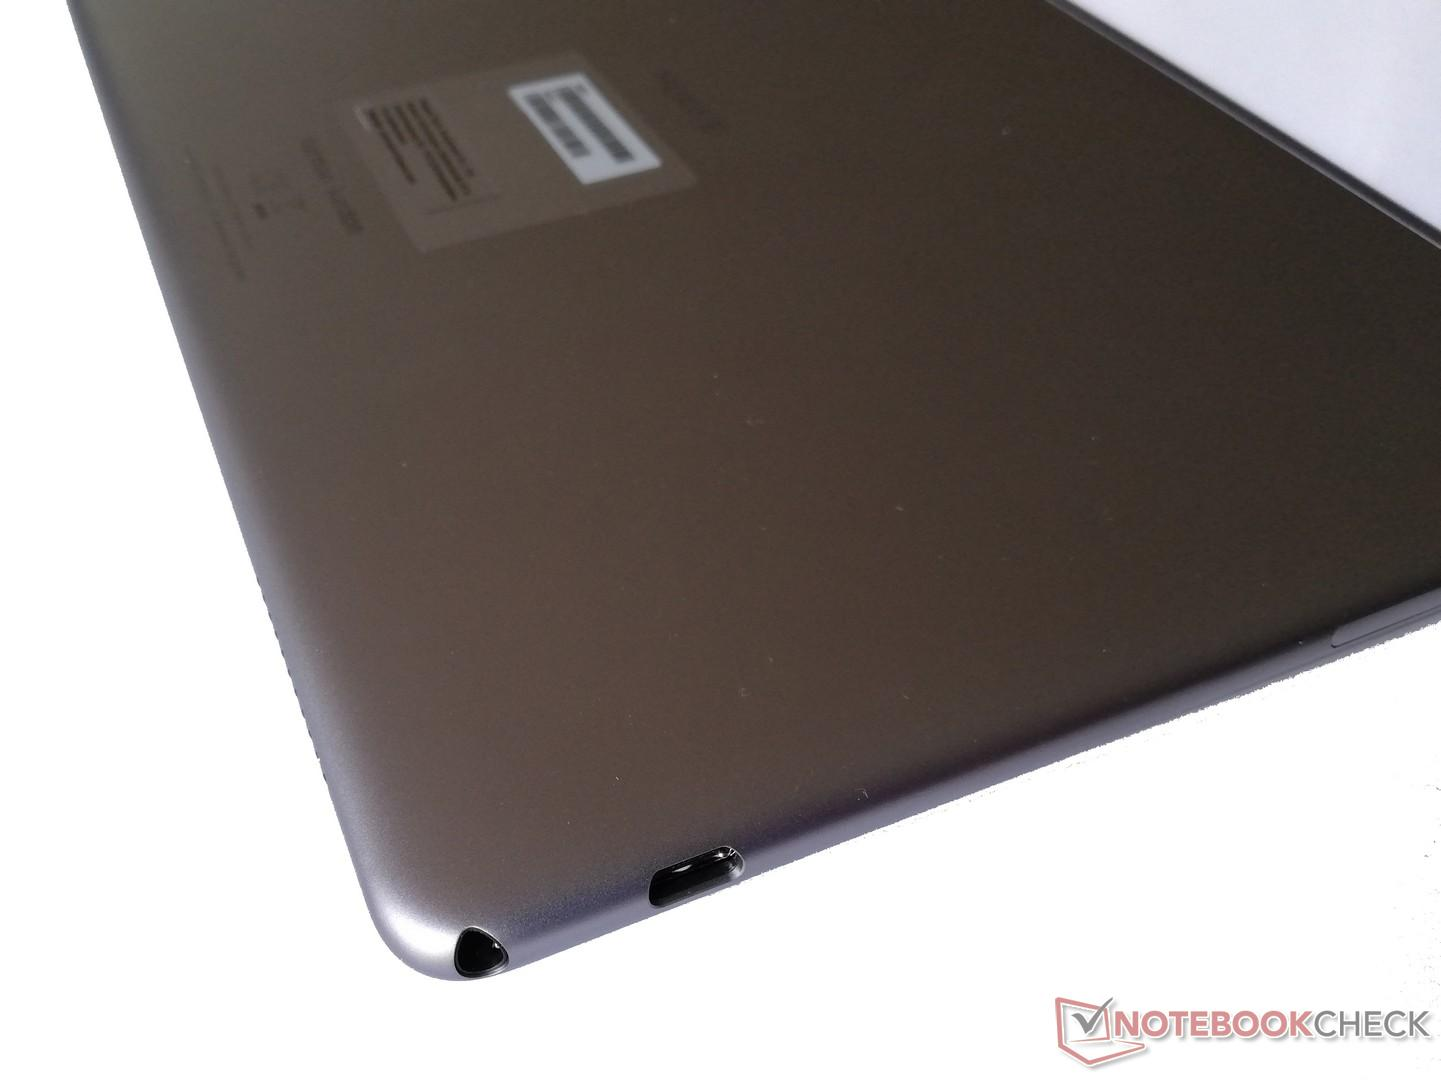 Huawei MediaPad M5 lite Tablet Review - NotebookCheck net